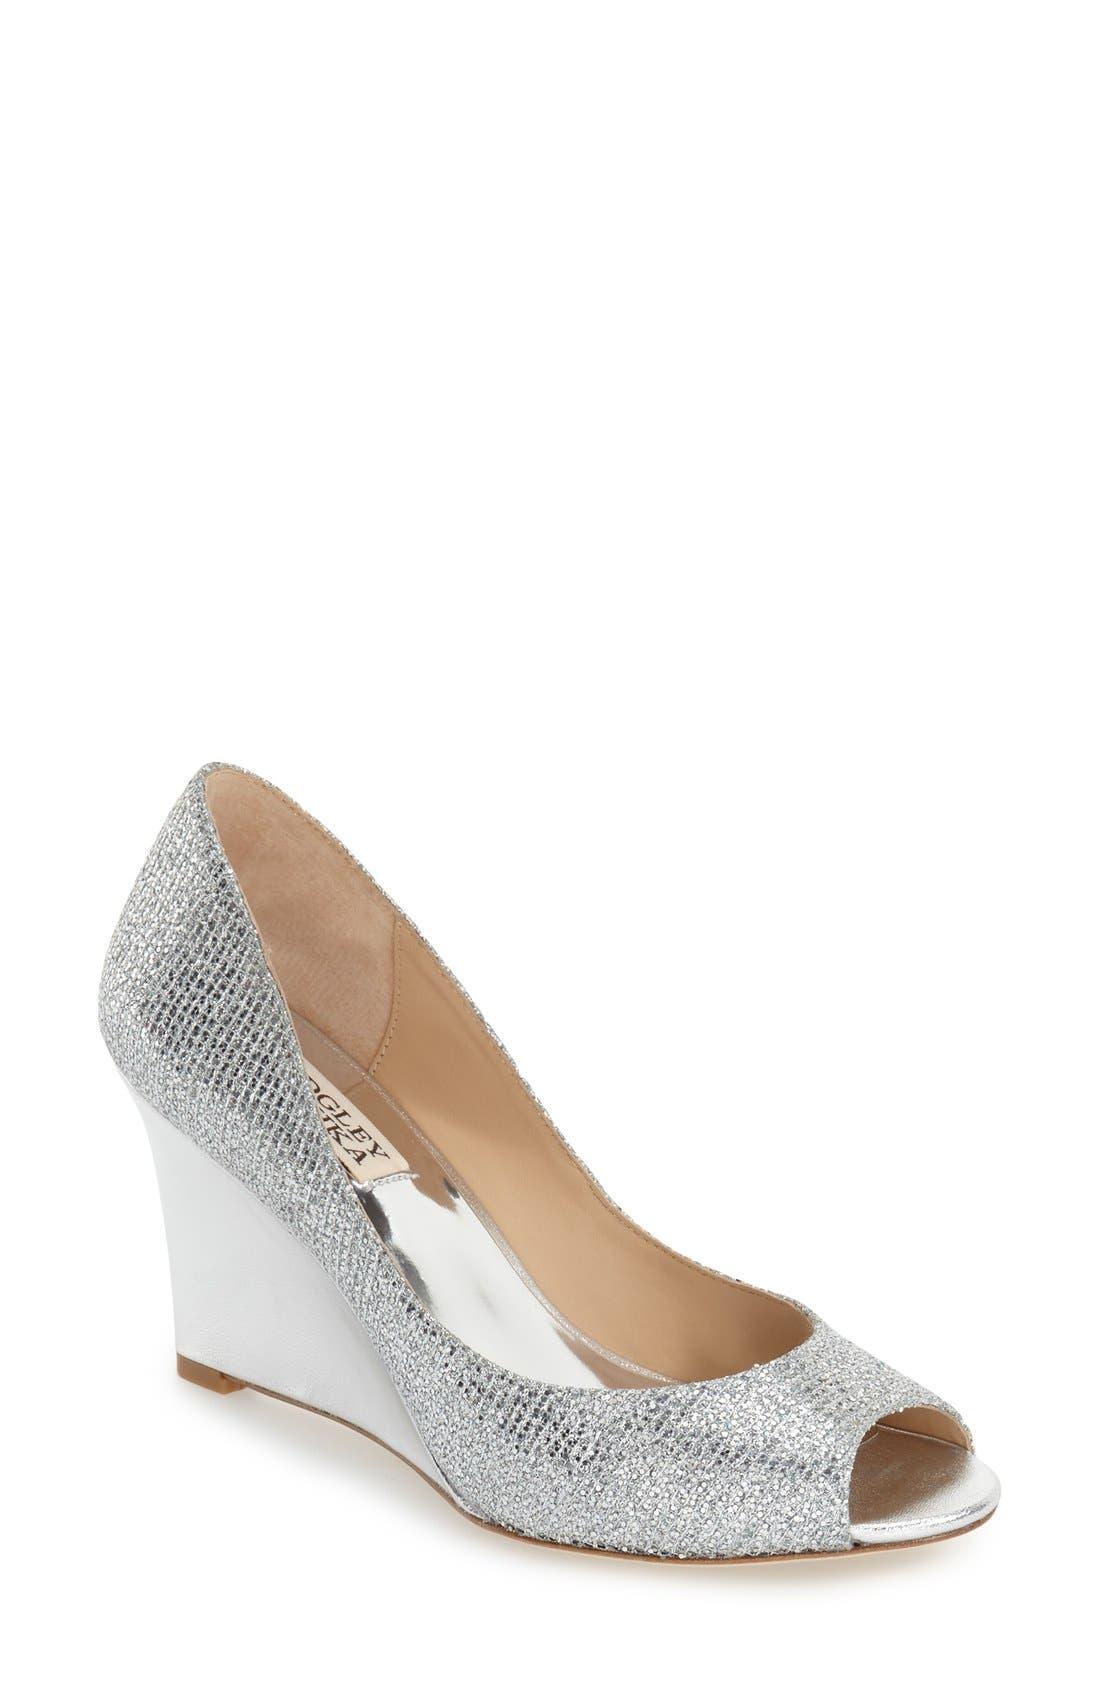 'Awake' Embellished Peep Toe Wedge Pump,                             Main thumbnail 1, color,                             Silver Glitter Fabric